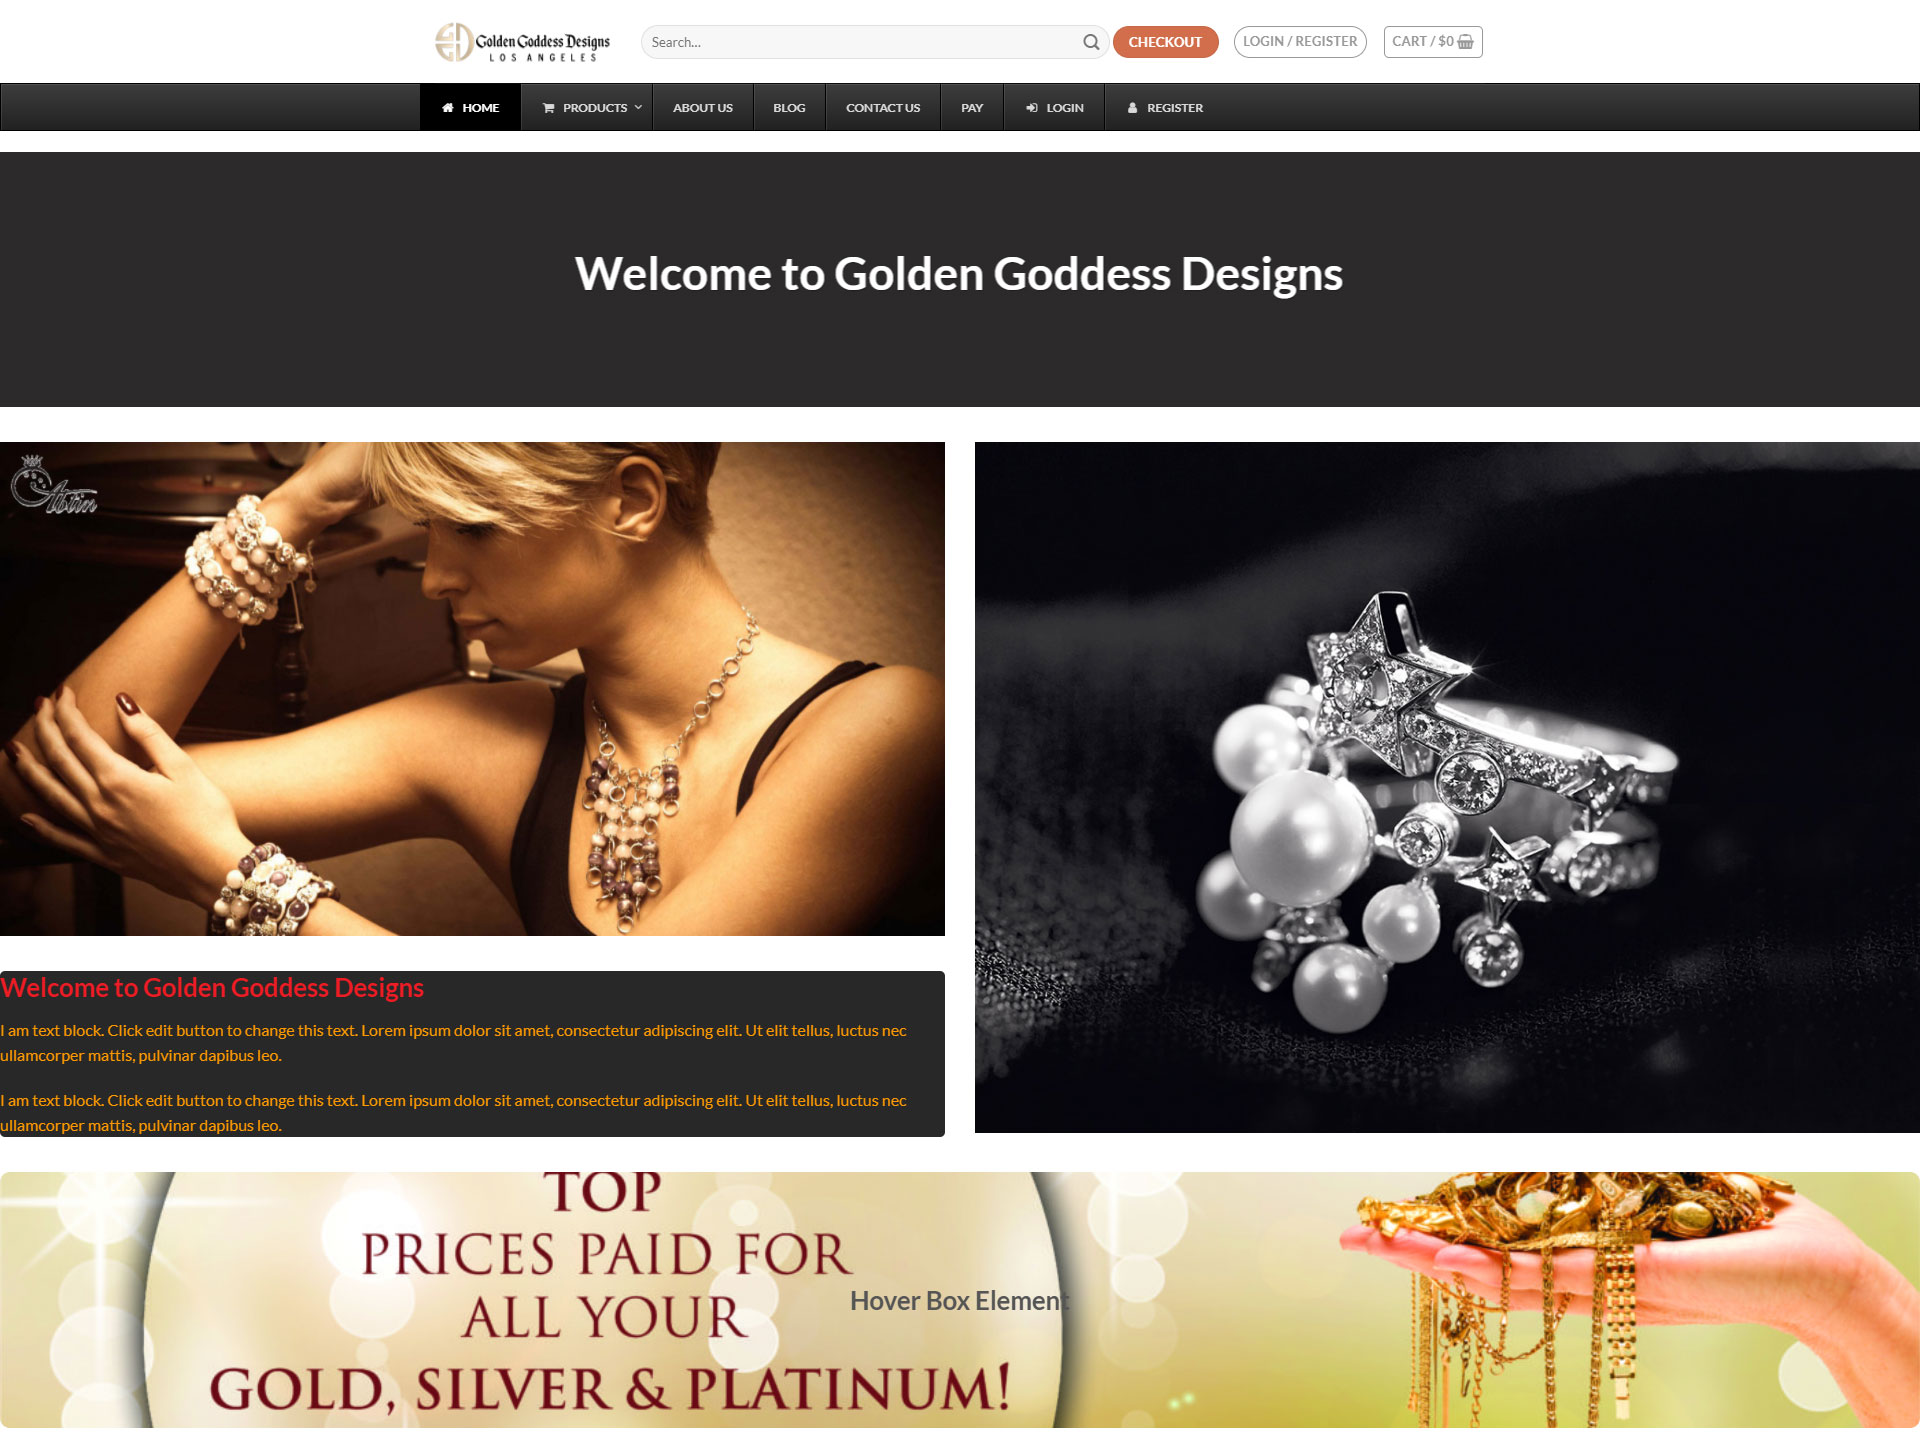 goldengoddessdesigns.com goldengoddessdesigns  نمونه طراحی وب سایت goldengoddessdesigns